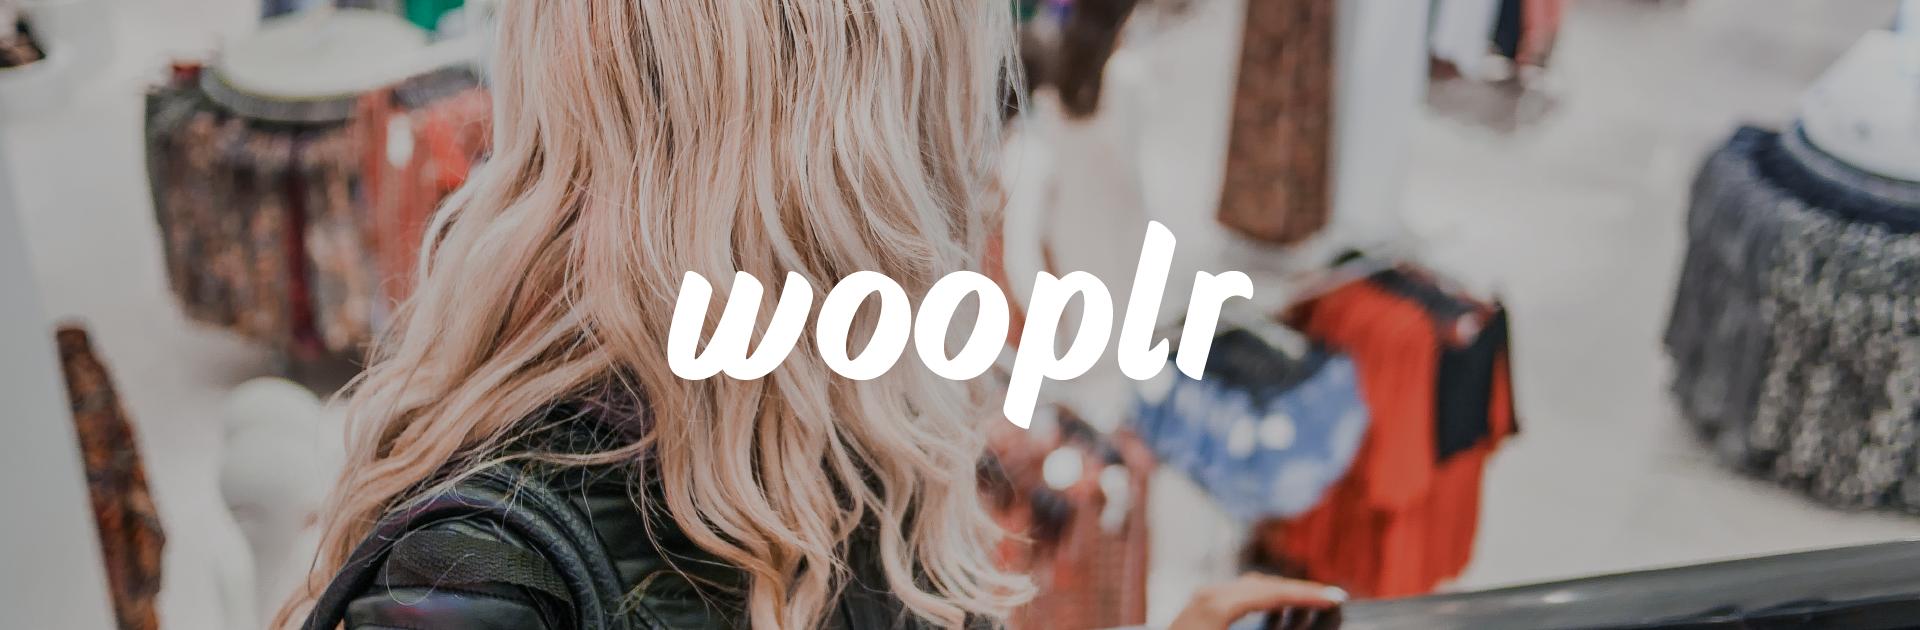 wooplr banner